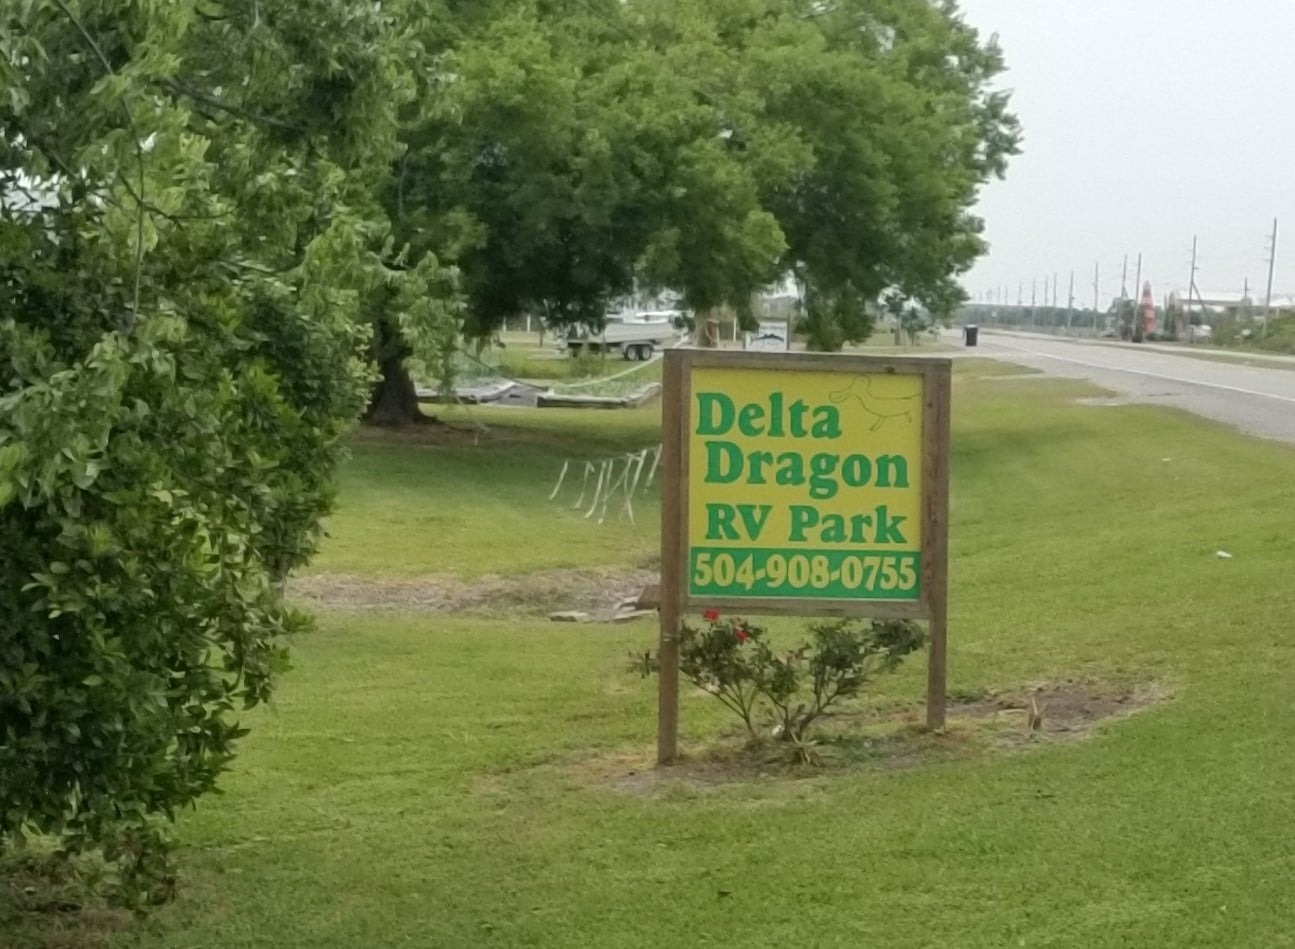 Delta Dragon Rv Park Rv World Network